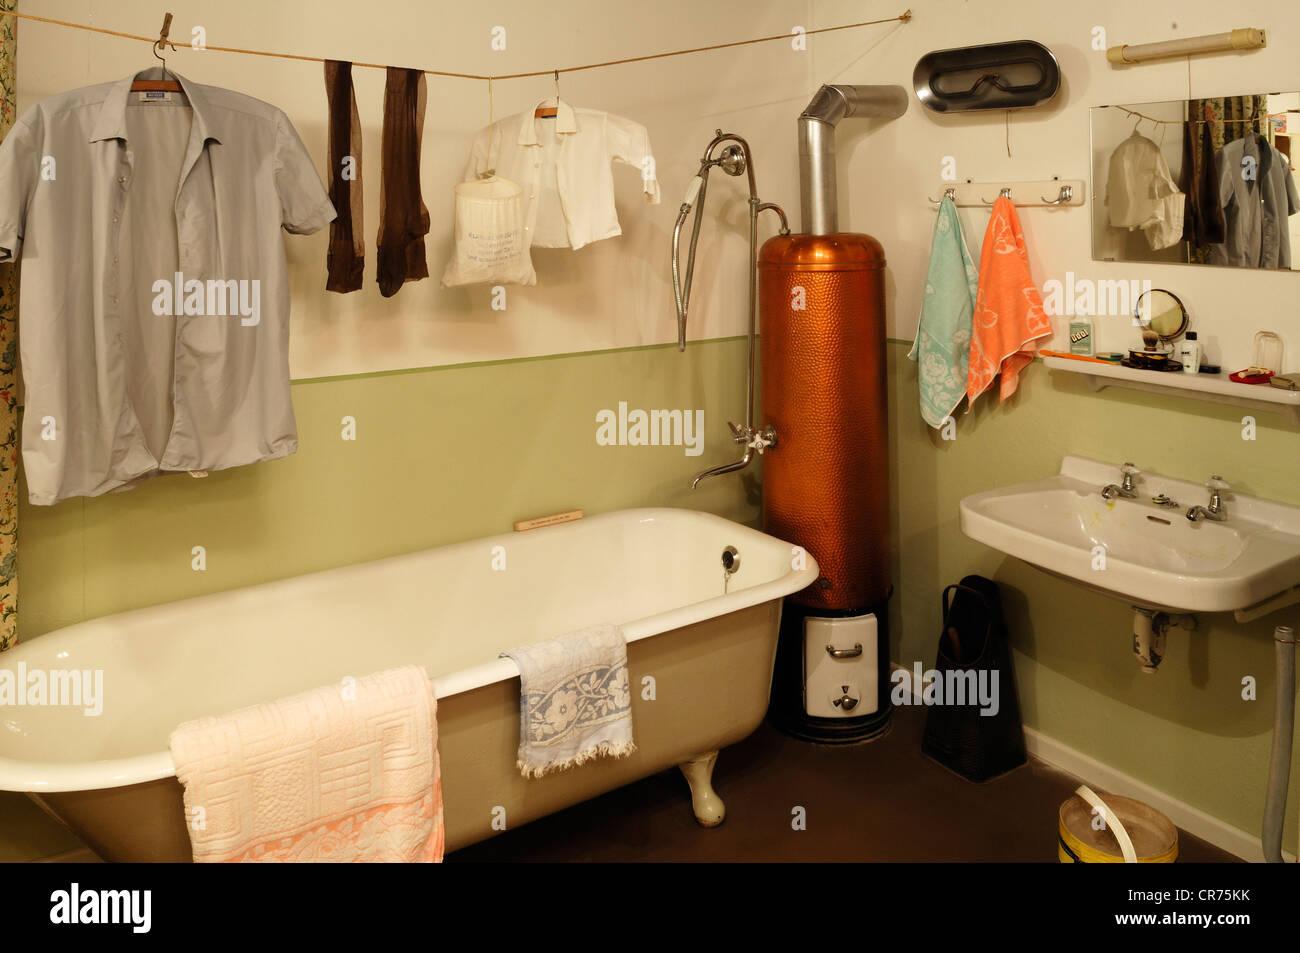 salle de bain anne 50 carrelage salle de bain annee carrelage salle de bain beau les meilleures. Black Bedroom Furniture Sets. Home Design Ideas